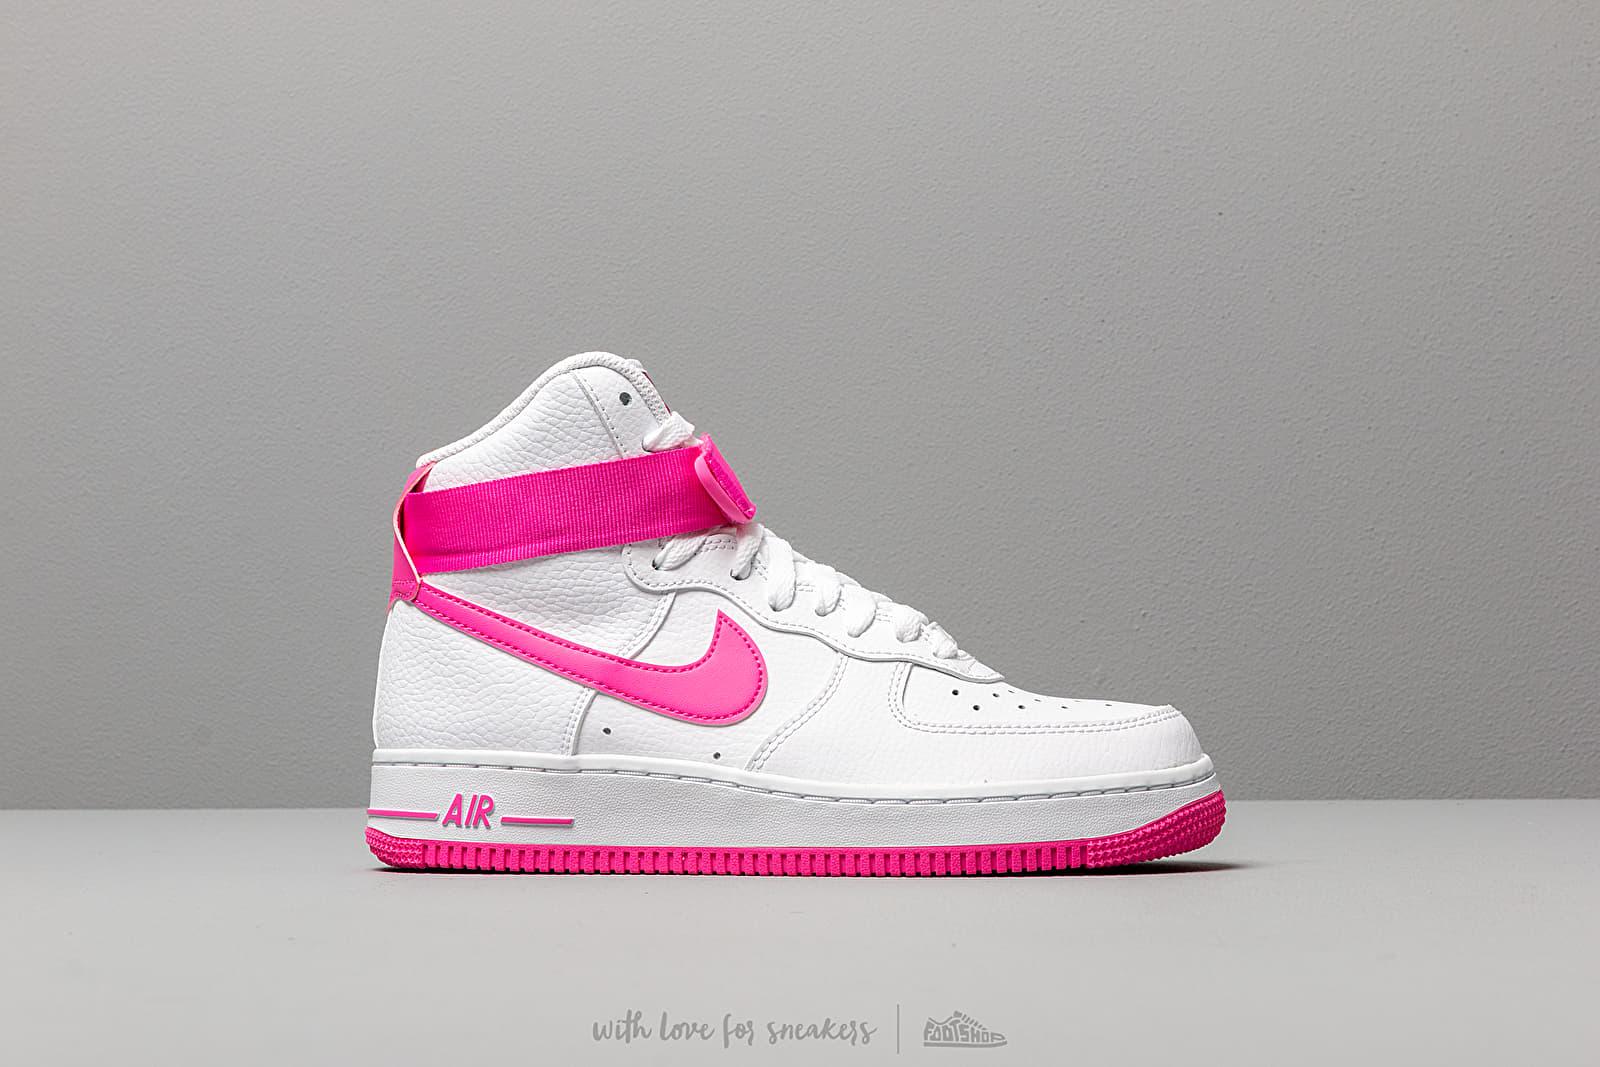 Sneakers | AIR FORCE 1 WhiteLaser FuchsiaTrue Berry | Nike